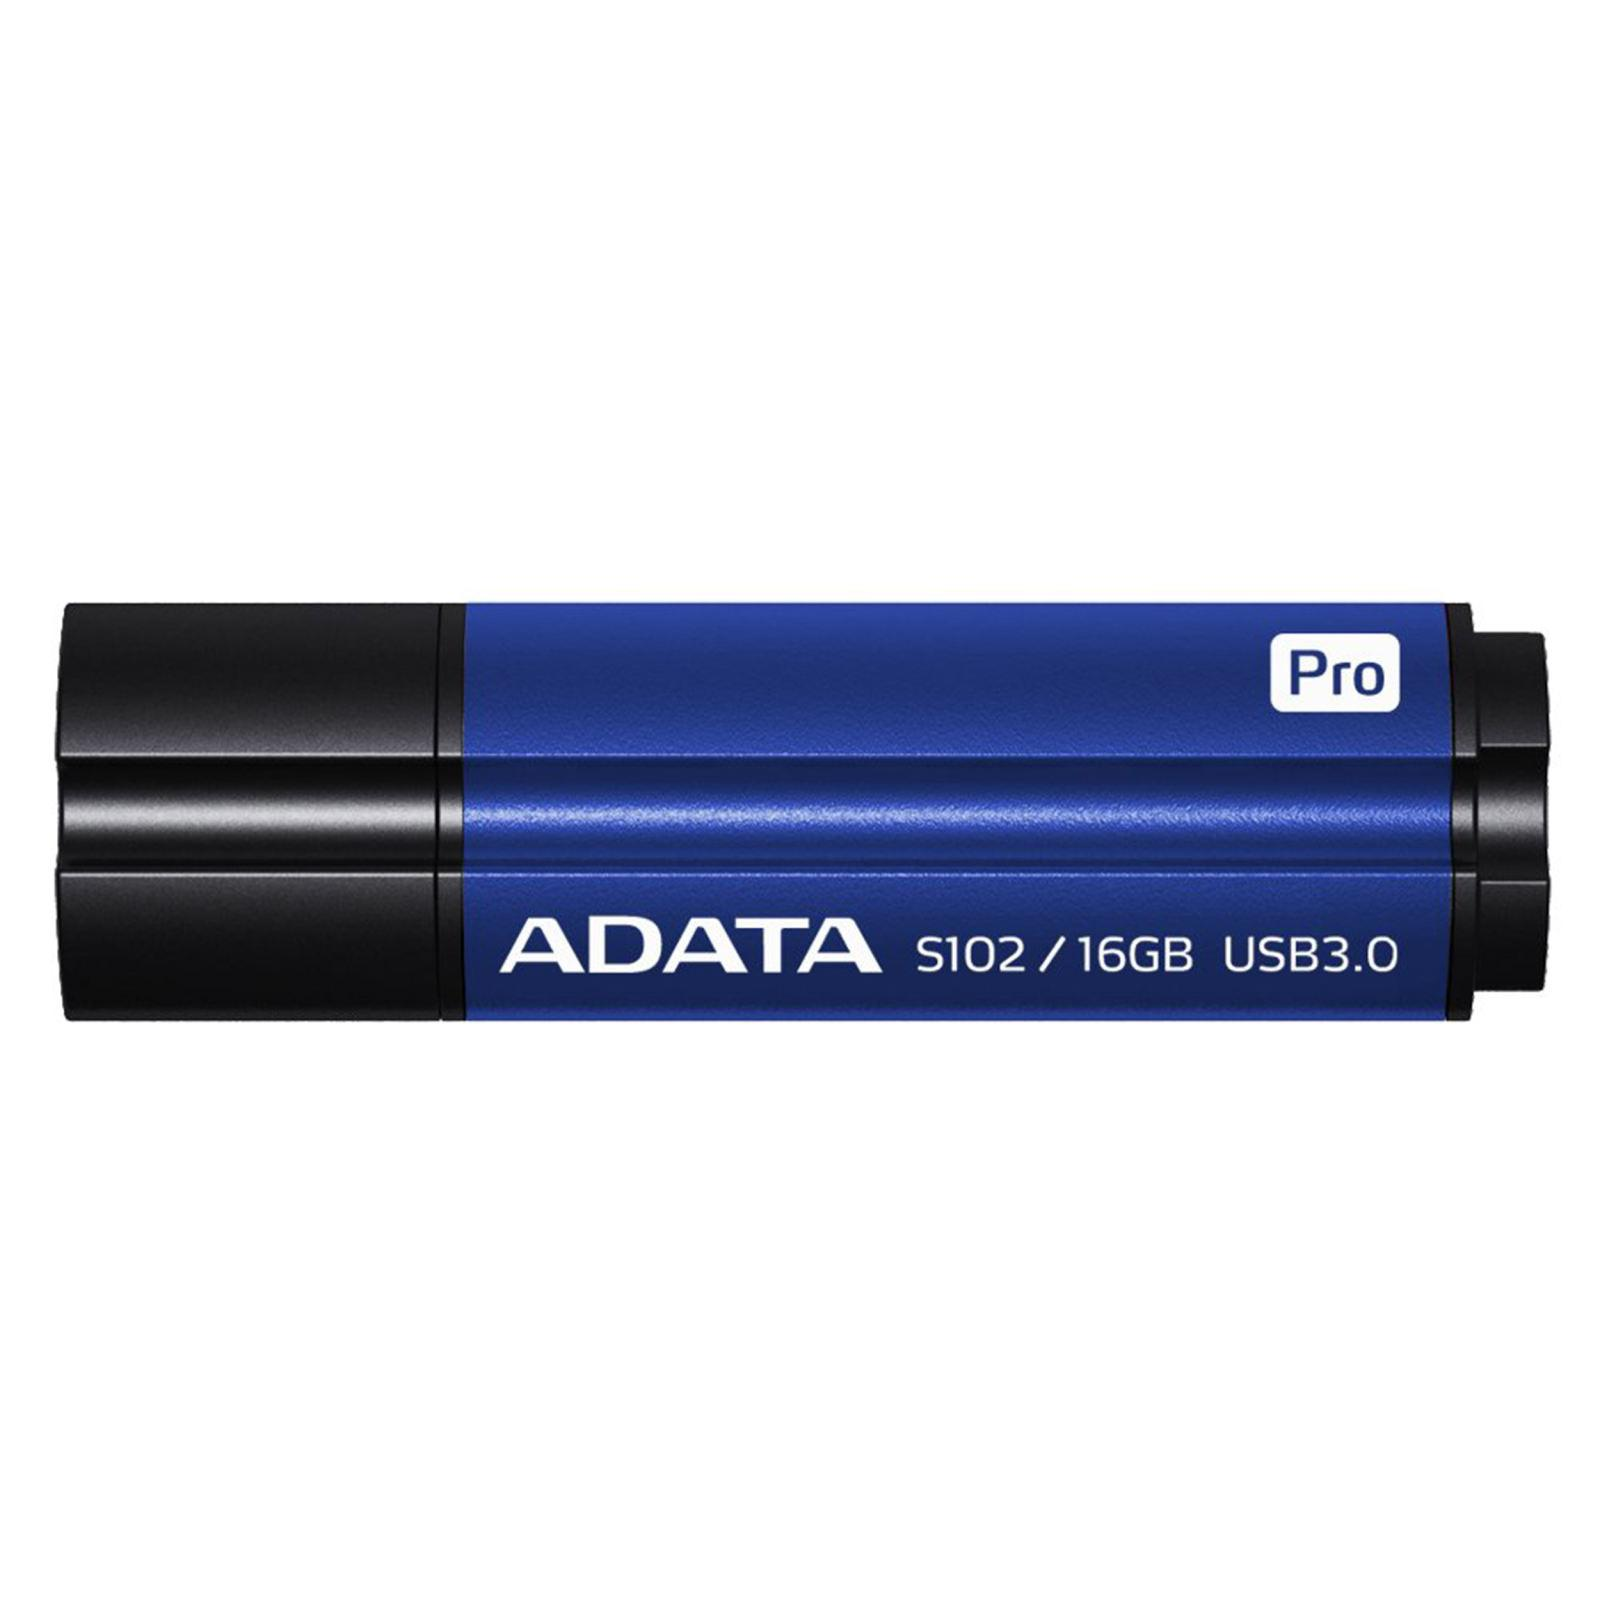 ADATA S102 Pro Flash Memory - 16GB